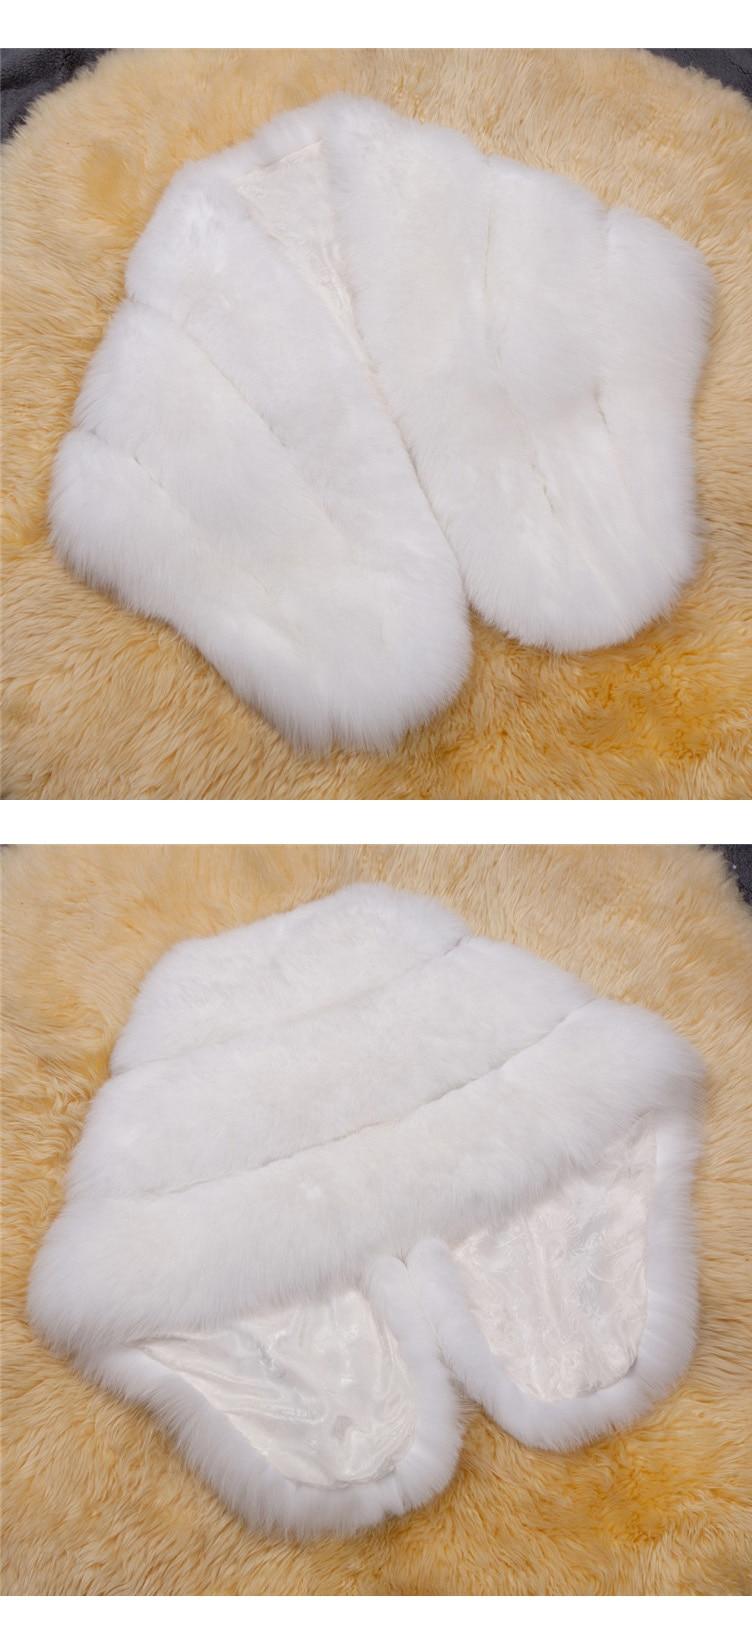 2018 Hcyo Korean version of the imitation of rabbit fur shawl imitation water mane fur grass cloak vest women's coat (11)